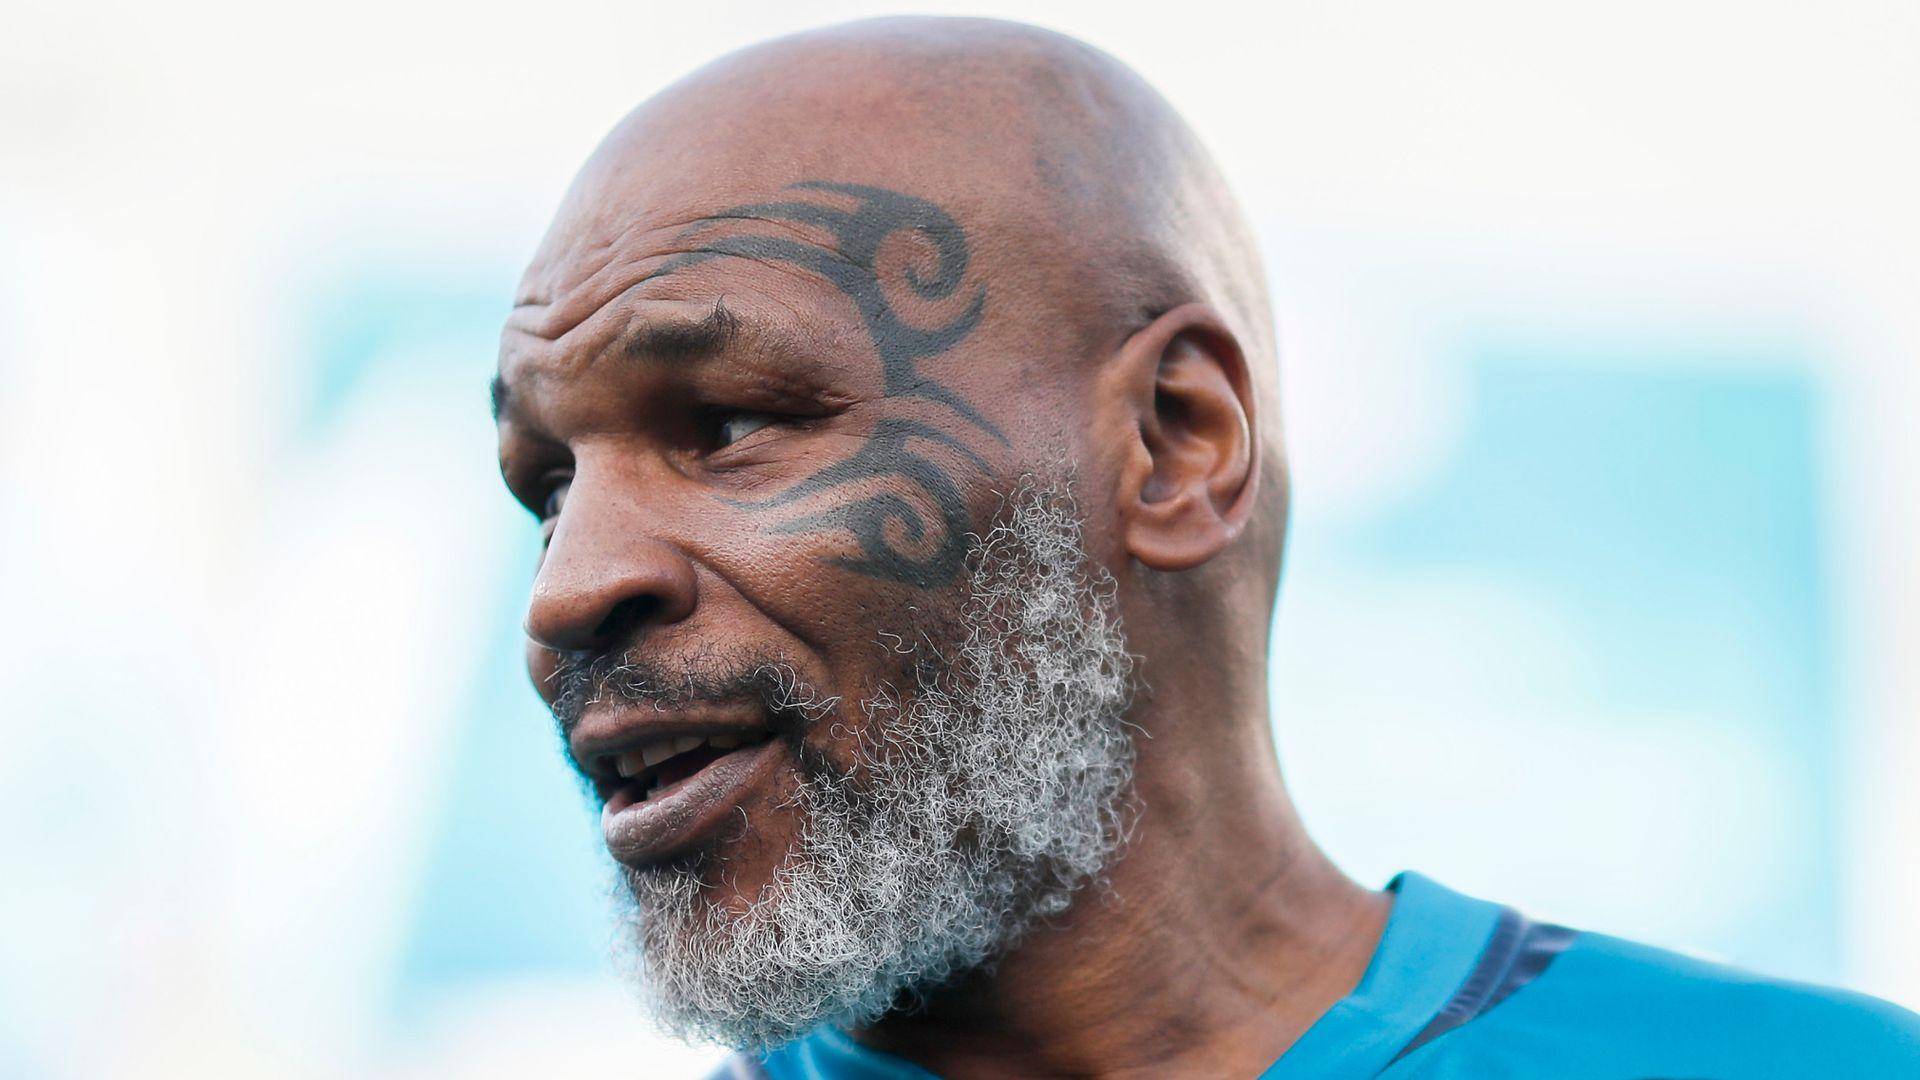 Still baddest man on planet? Tyson, 53, 'wants to box'